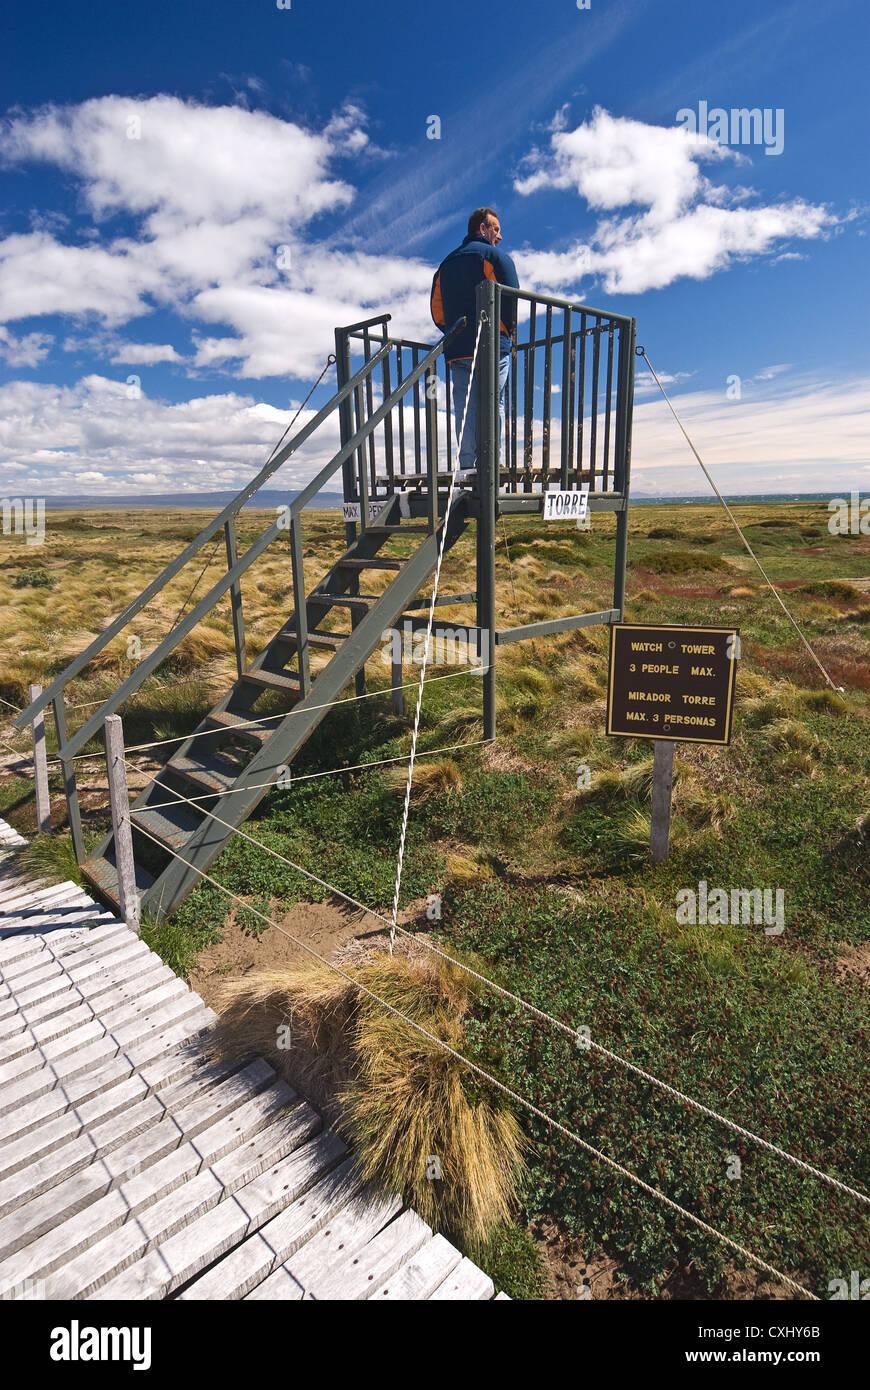 Elk198-4163v Chile, Patagonia, Seno Otway Reserva Pingüino, torre mirador Imagen De Stock